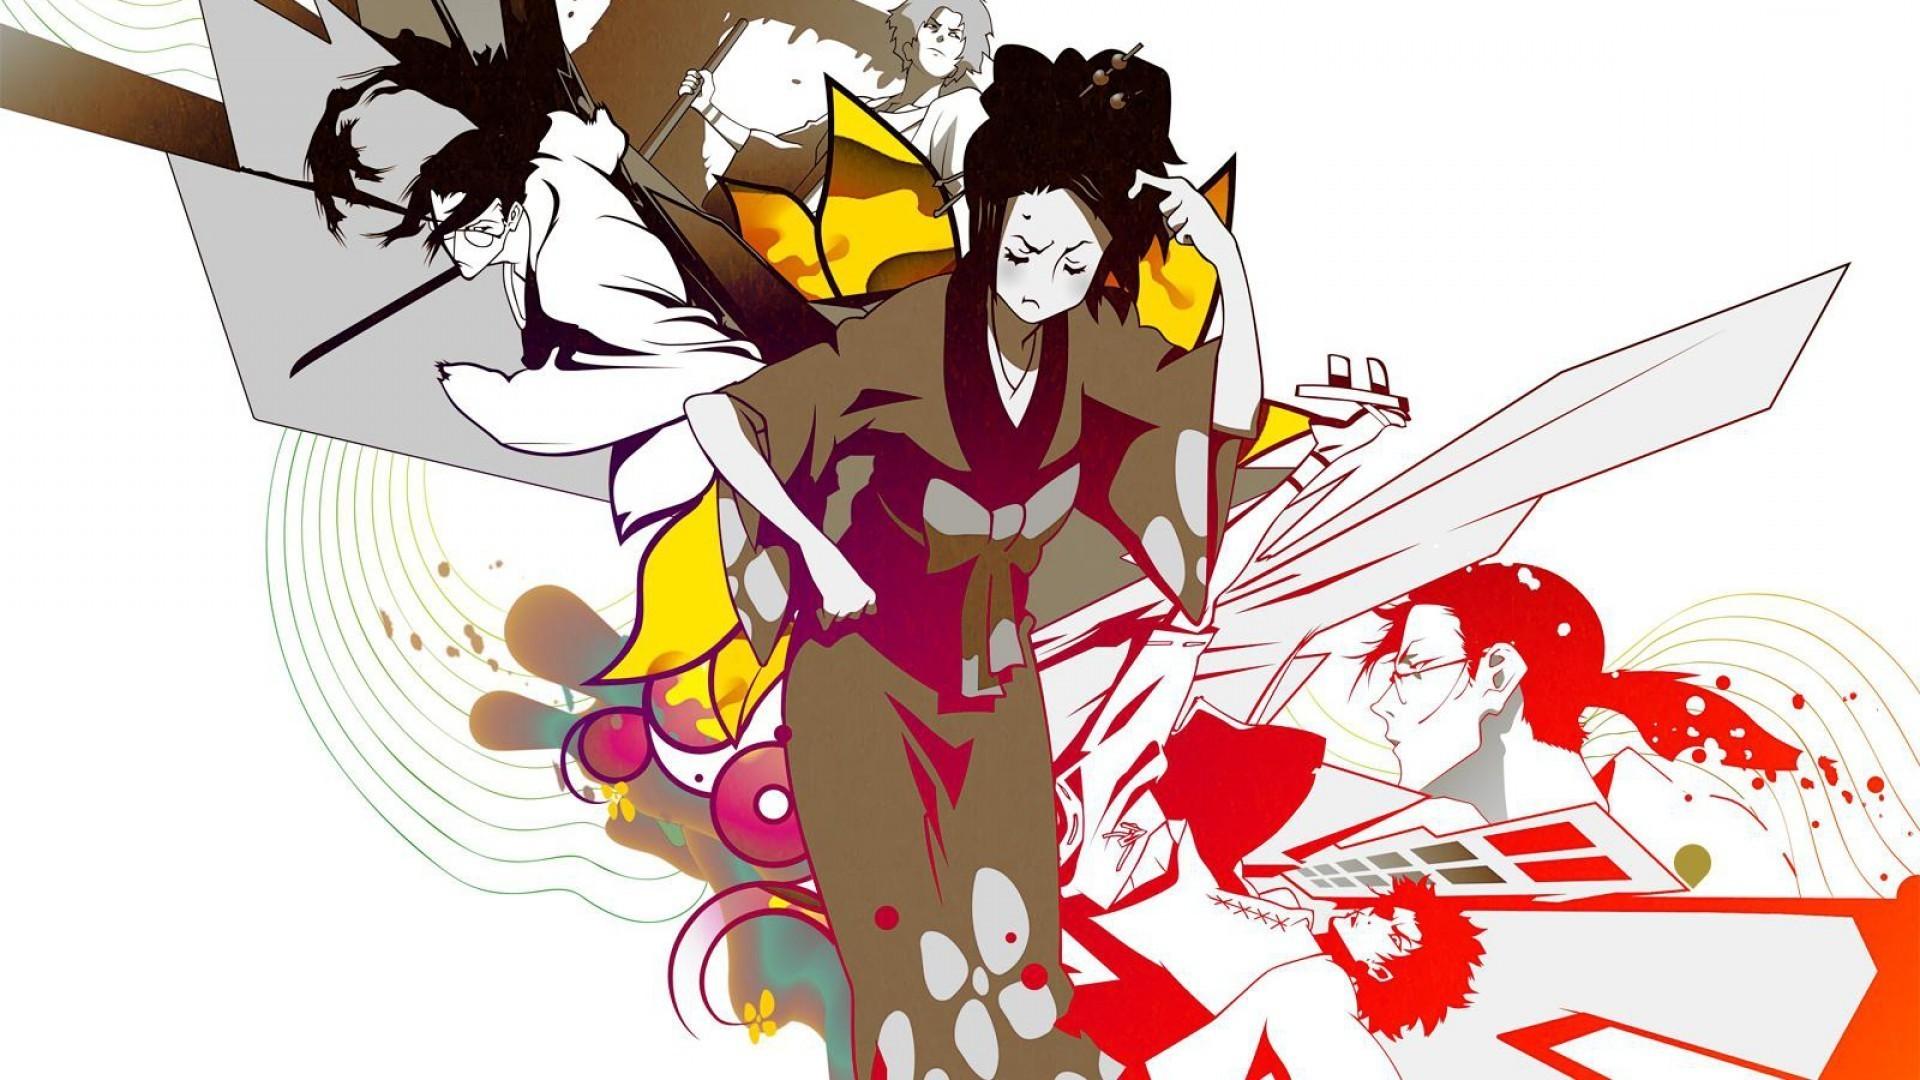 anime, Samurai Champloo, Fuu, Mugen, Jin (Samurai Champloo) Wallpapers HD /  Desktop and Mobile Backgrounds